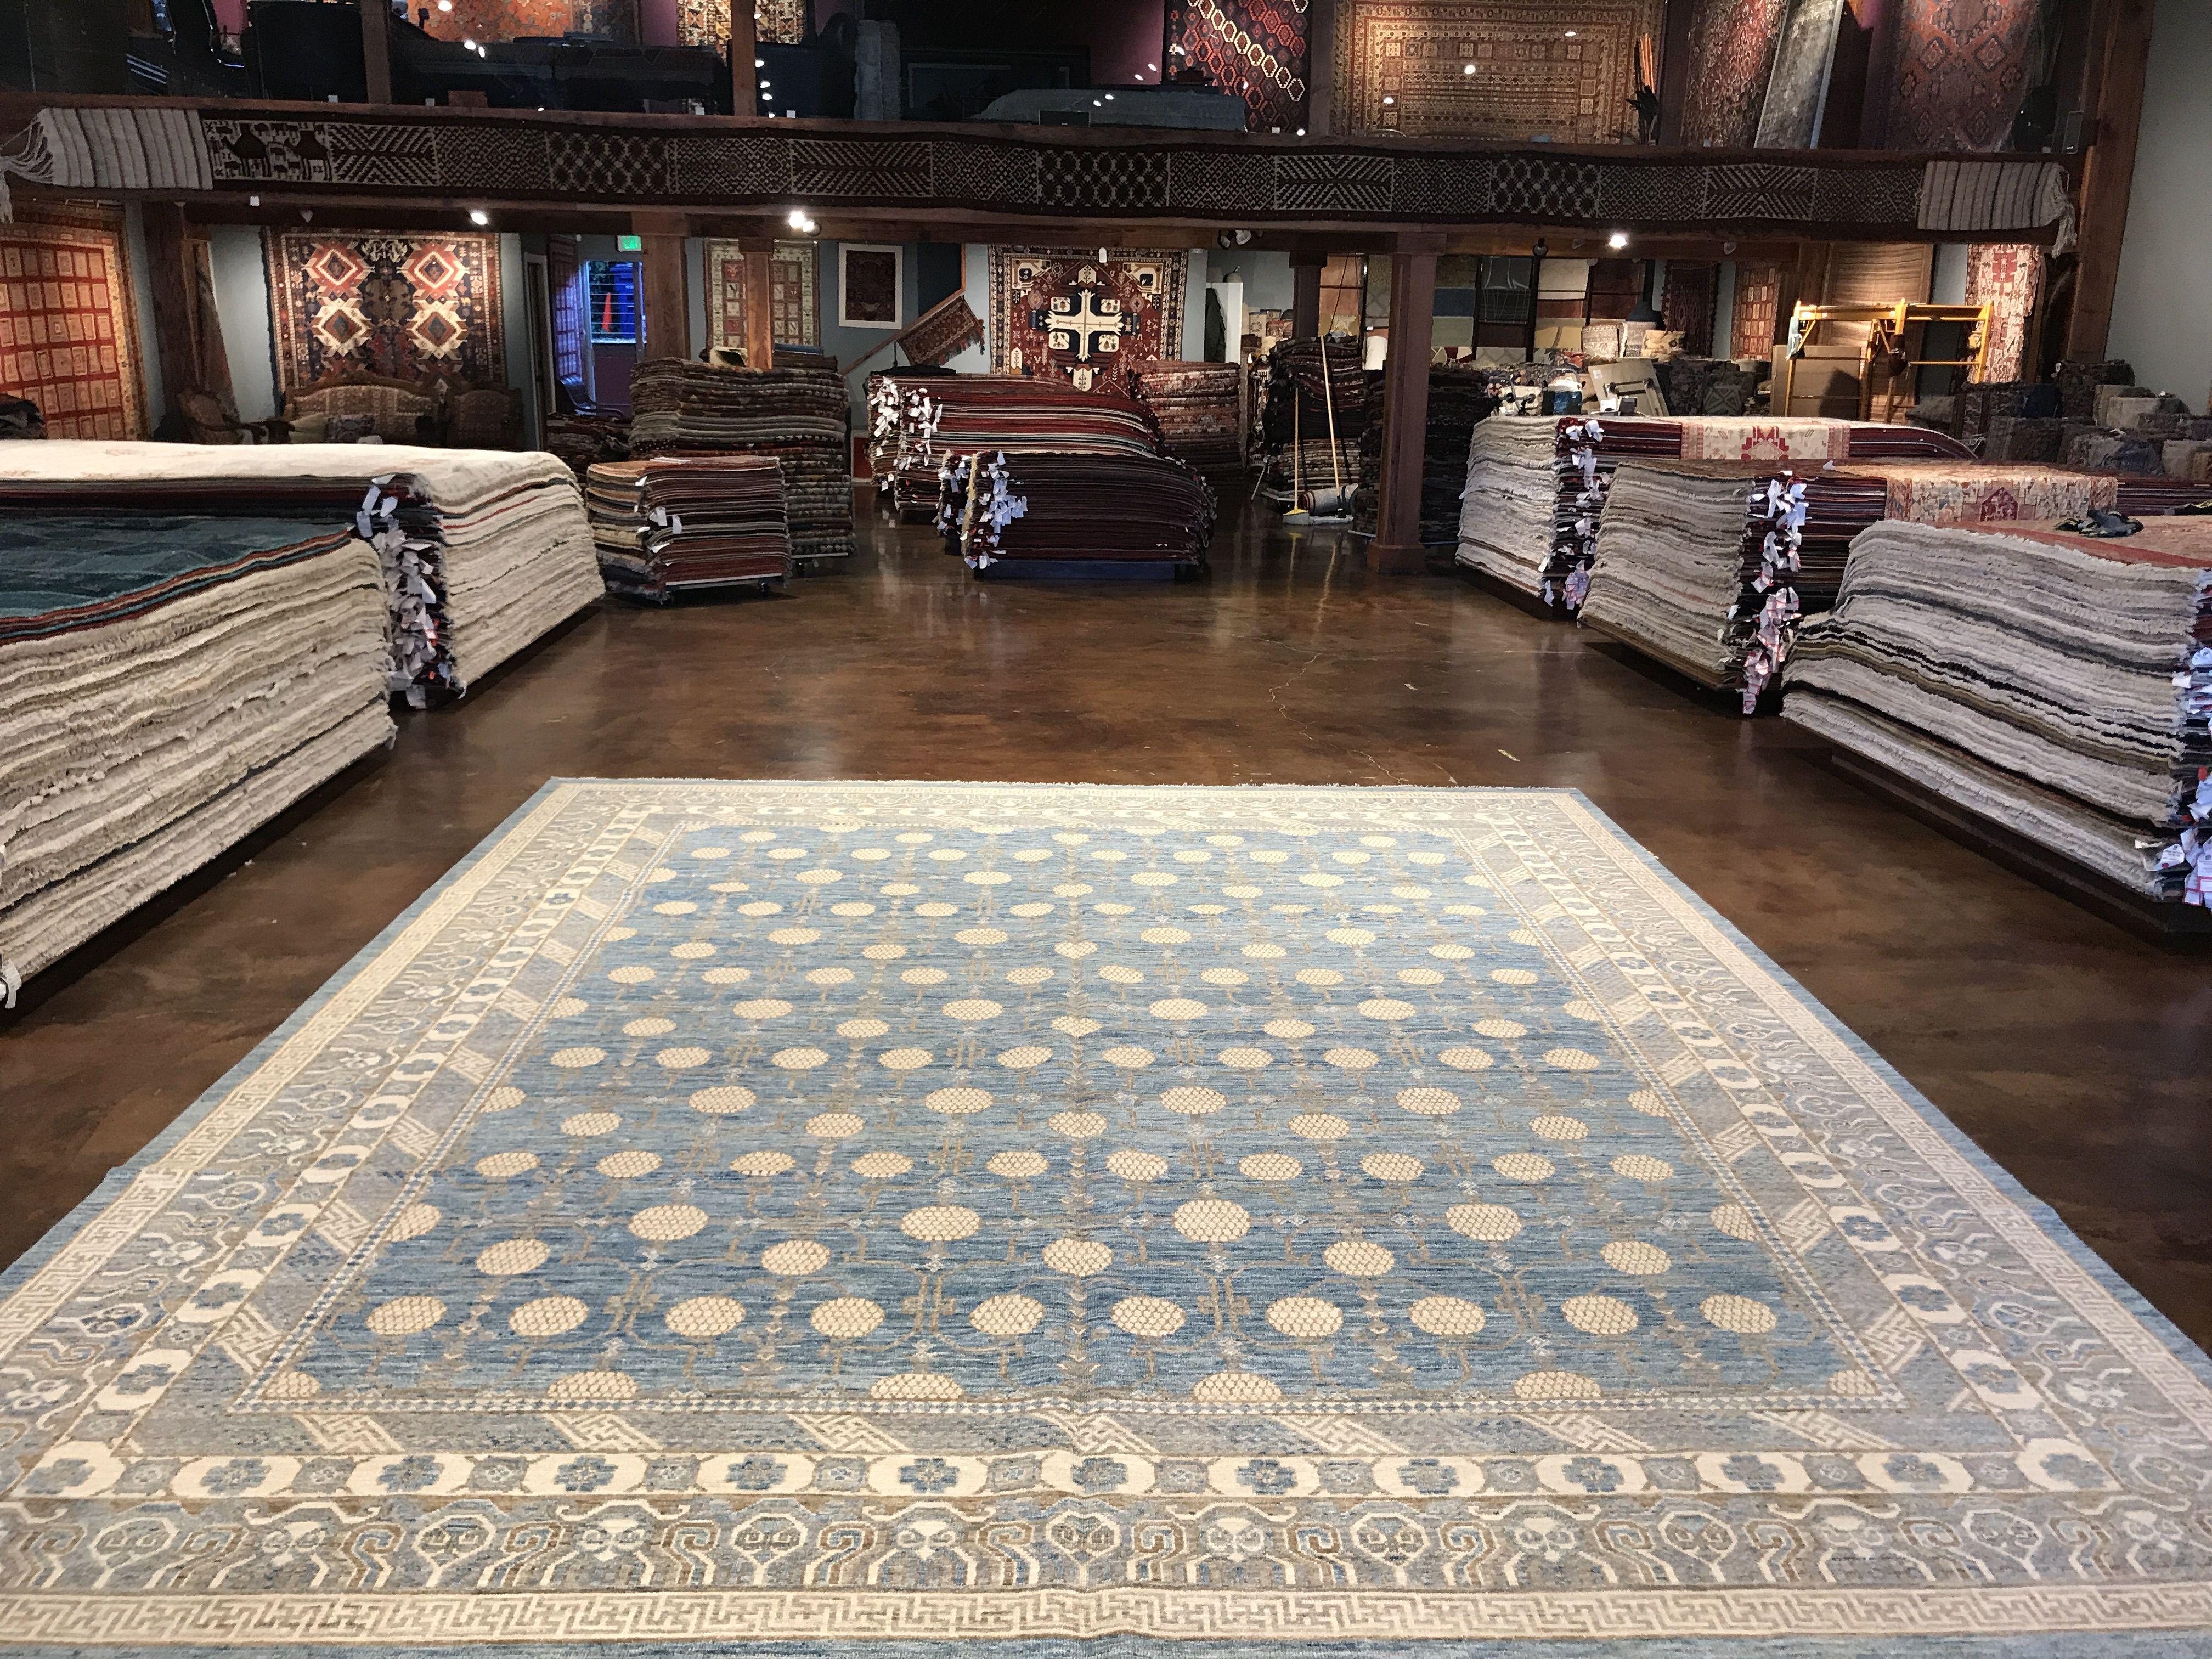 12x15 Berkeley Rugs Rugs On Carpet Handwoven Carpets